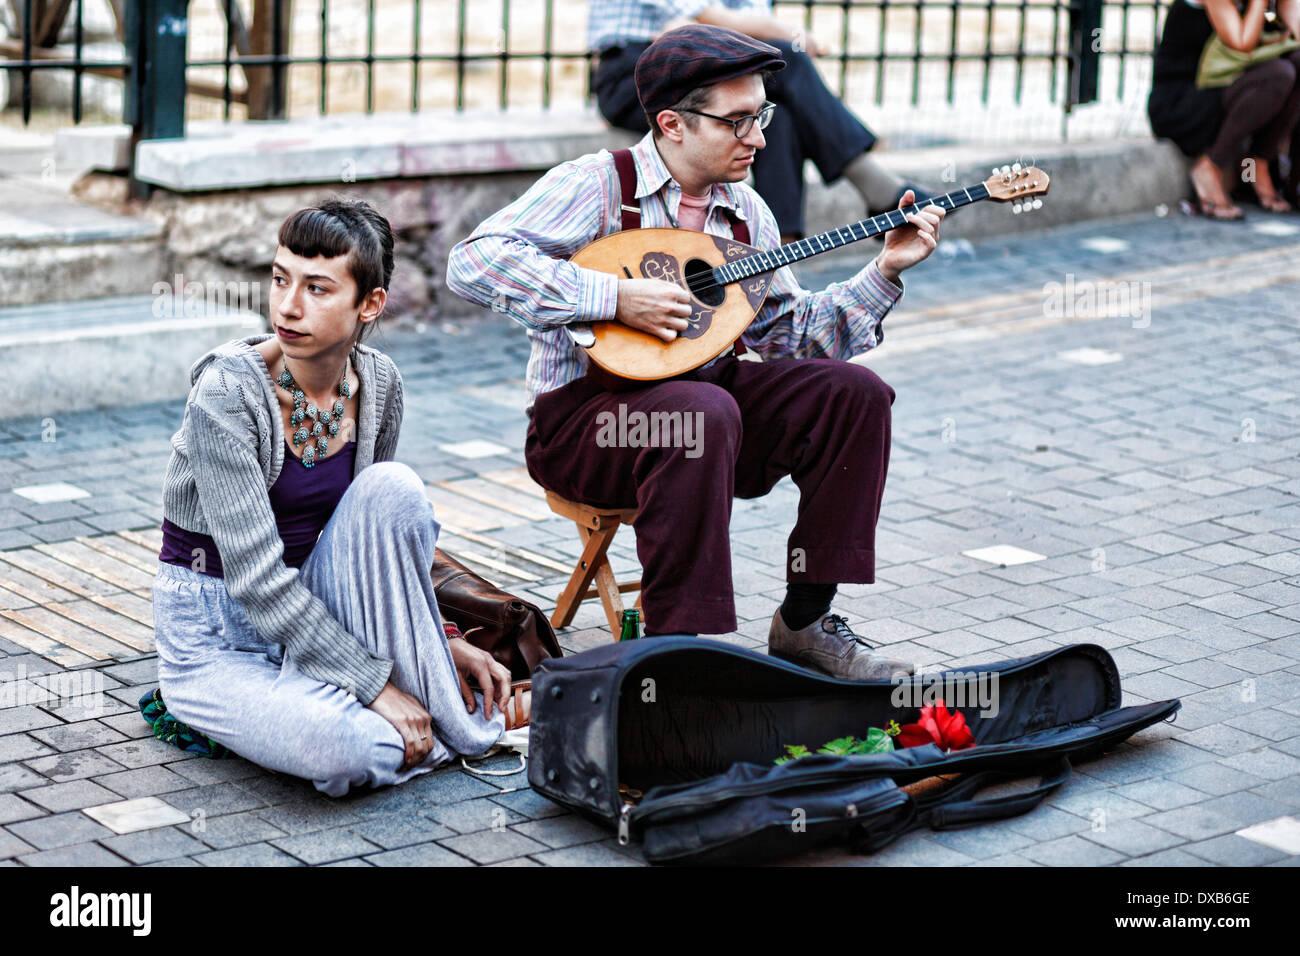 Bouzouki músicos tocando en la calle de Atenas, Grecia Imagen De Stock